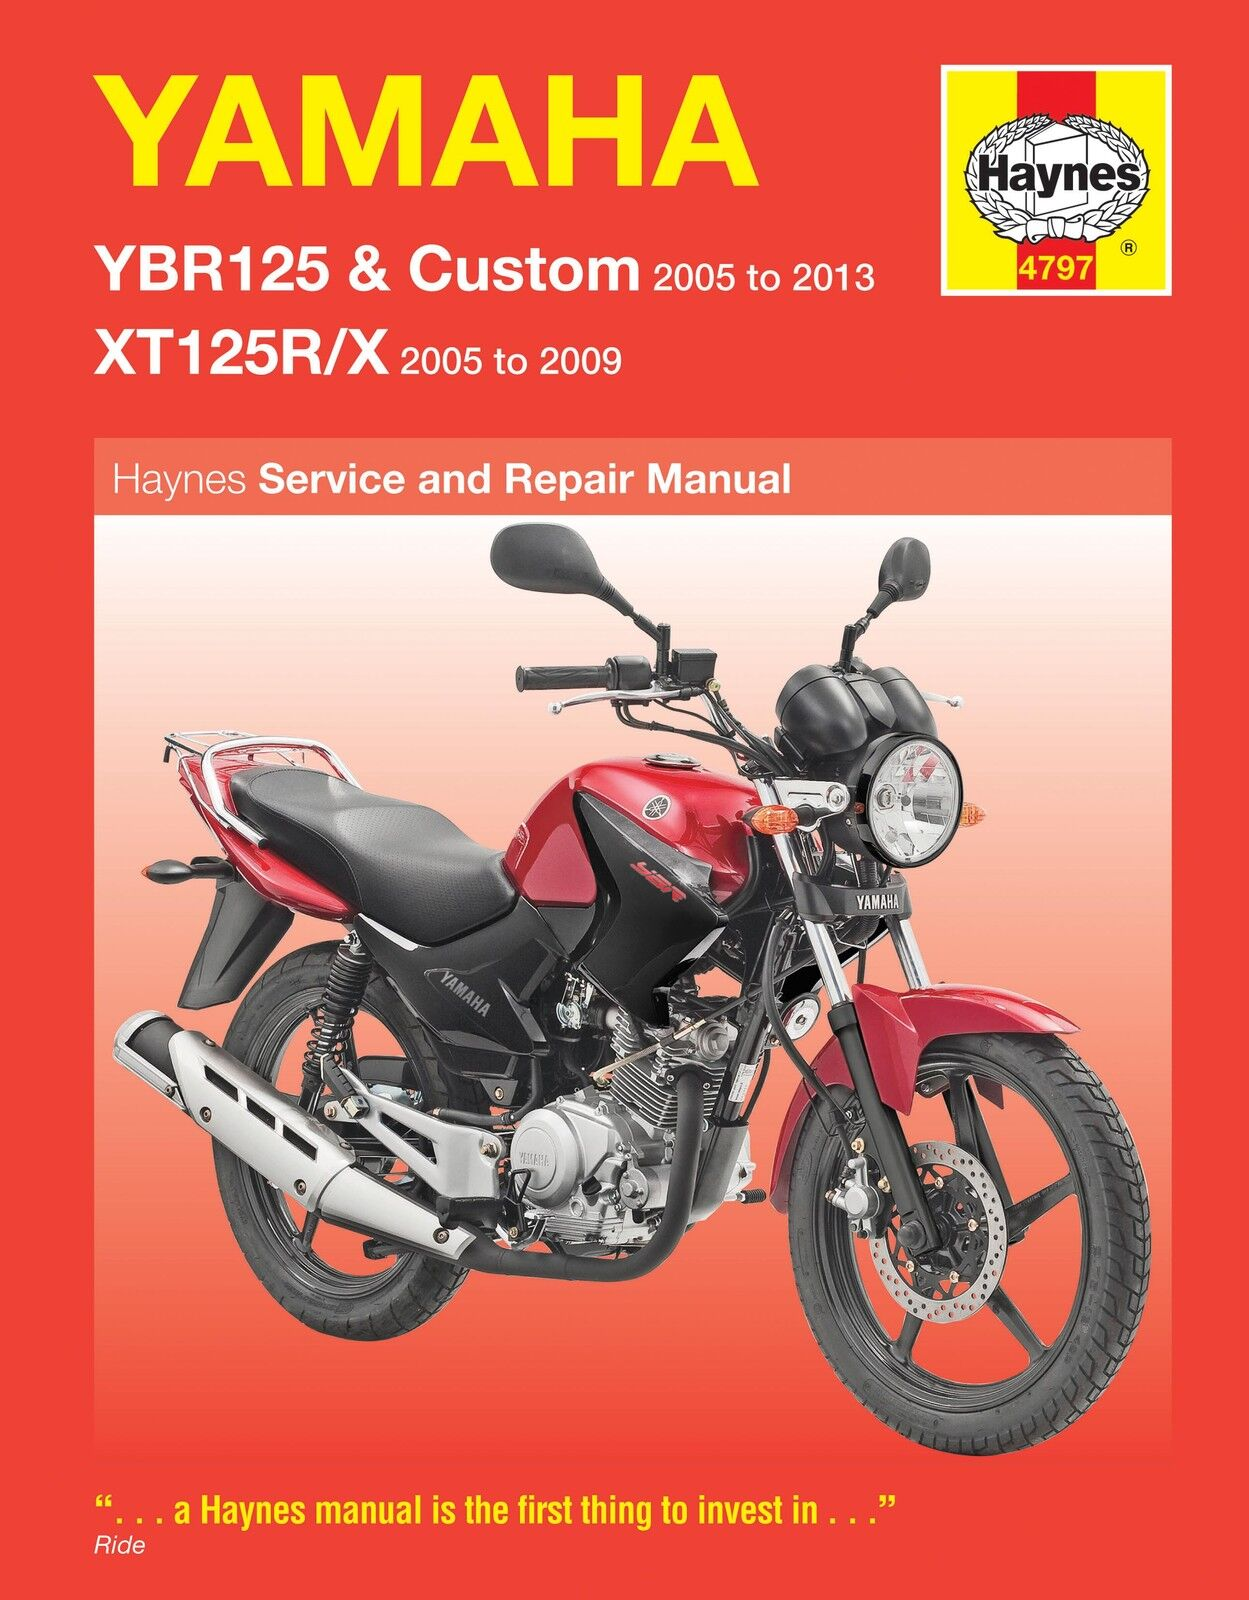 HAYNES 4797 MOTORCYCLE SERVICE REPAIR MANUAL YAMAHA YBR125 XT125R/X 2005 - 2009